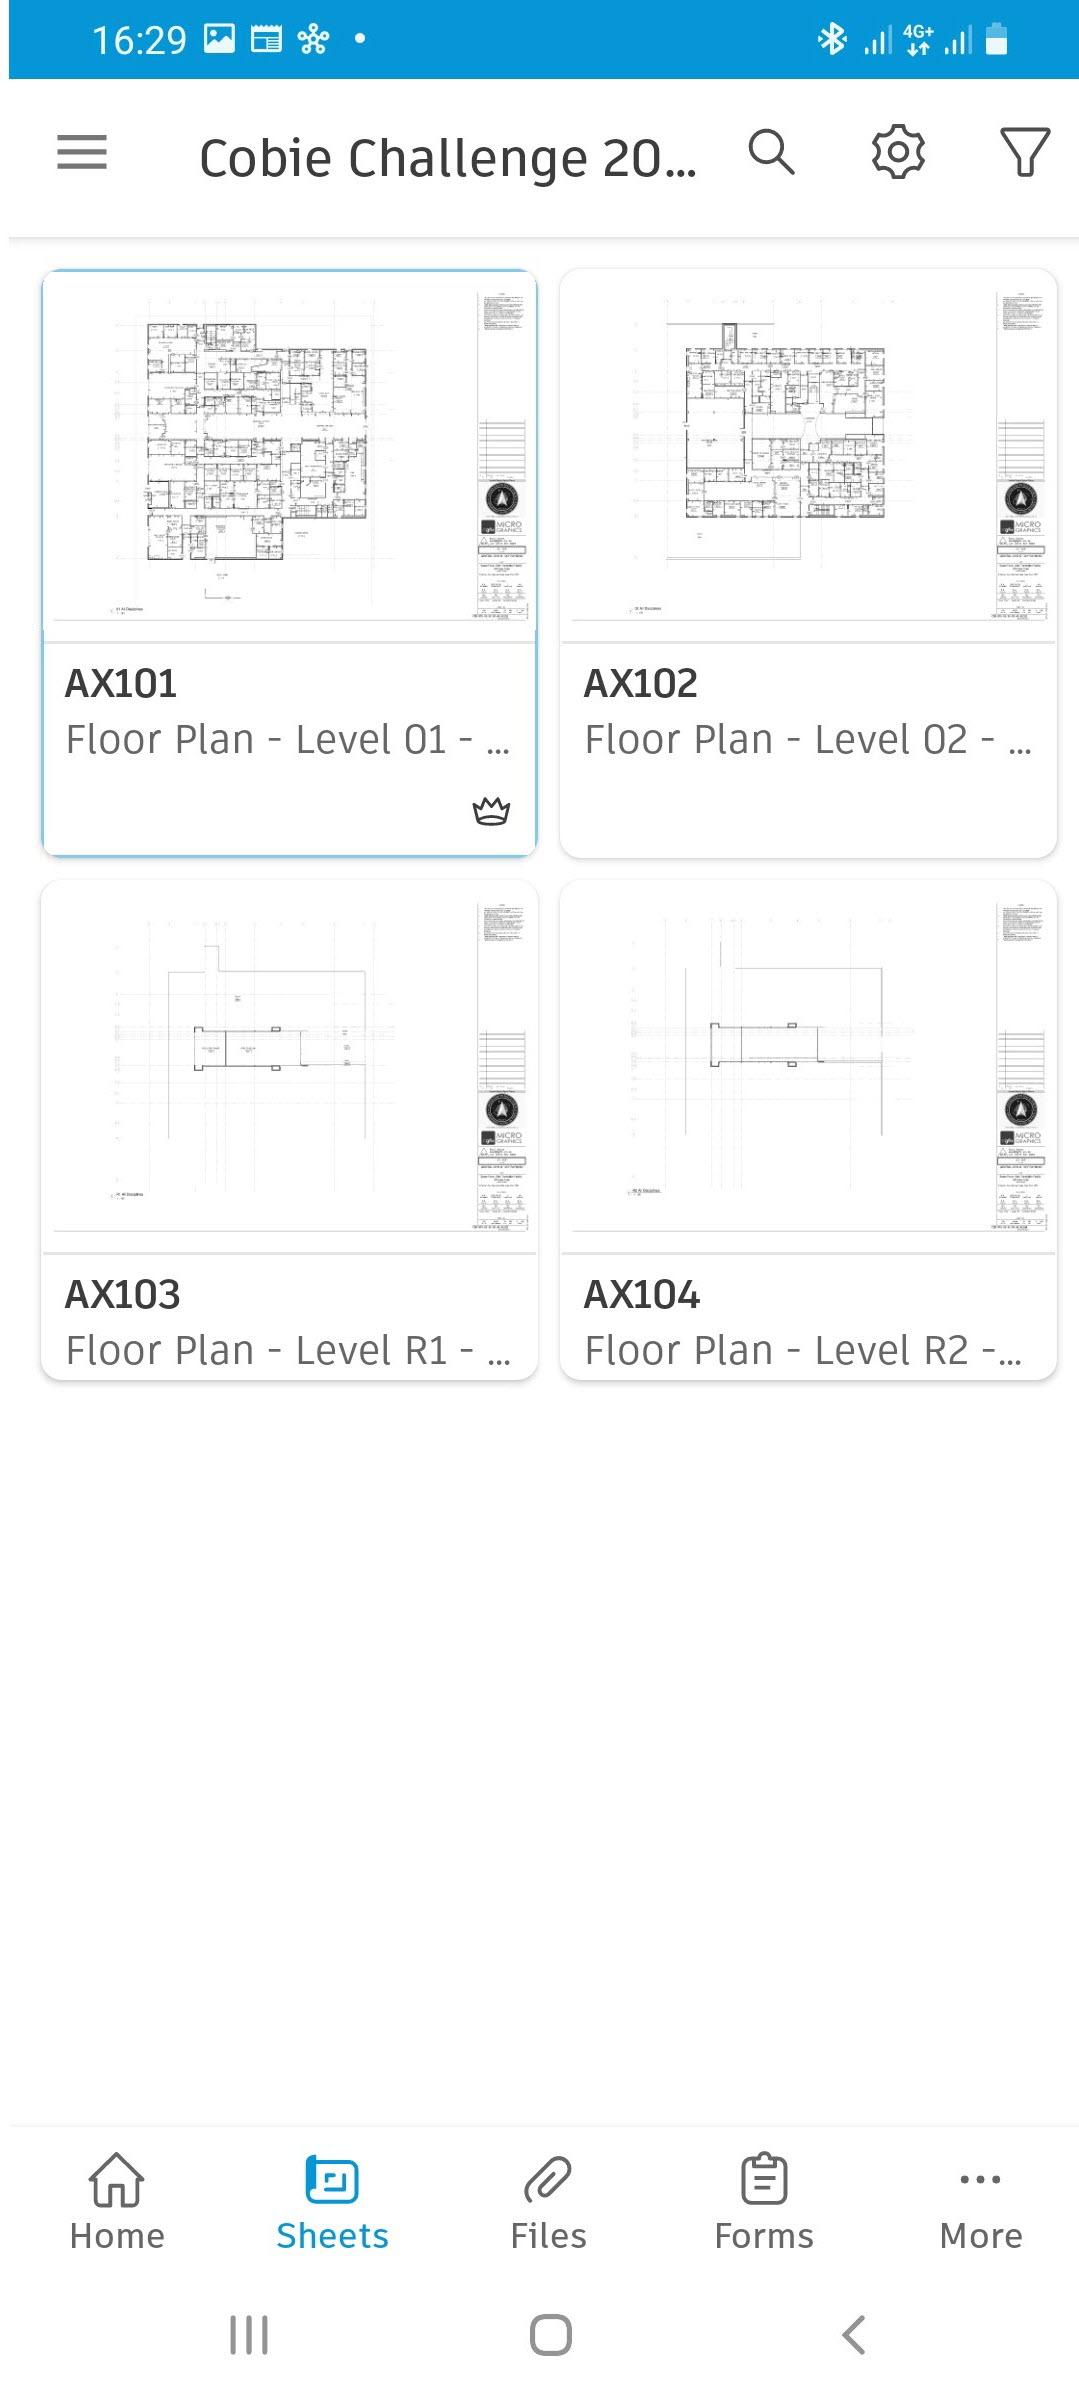 Autodesk, Micrographics, Autodesk Build, Autodesk PlanGrid, Mobile App, Web Browser